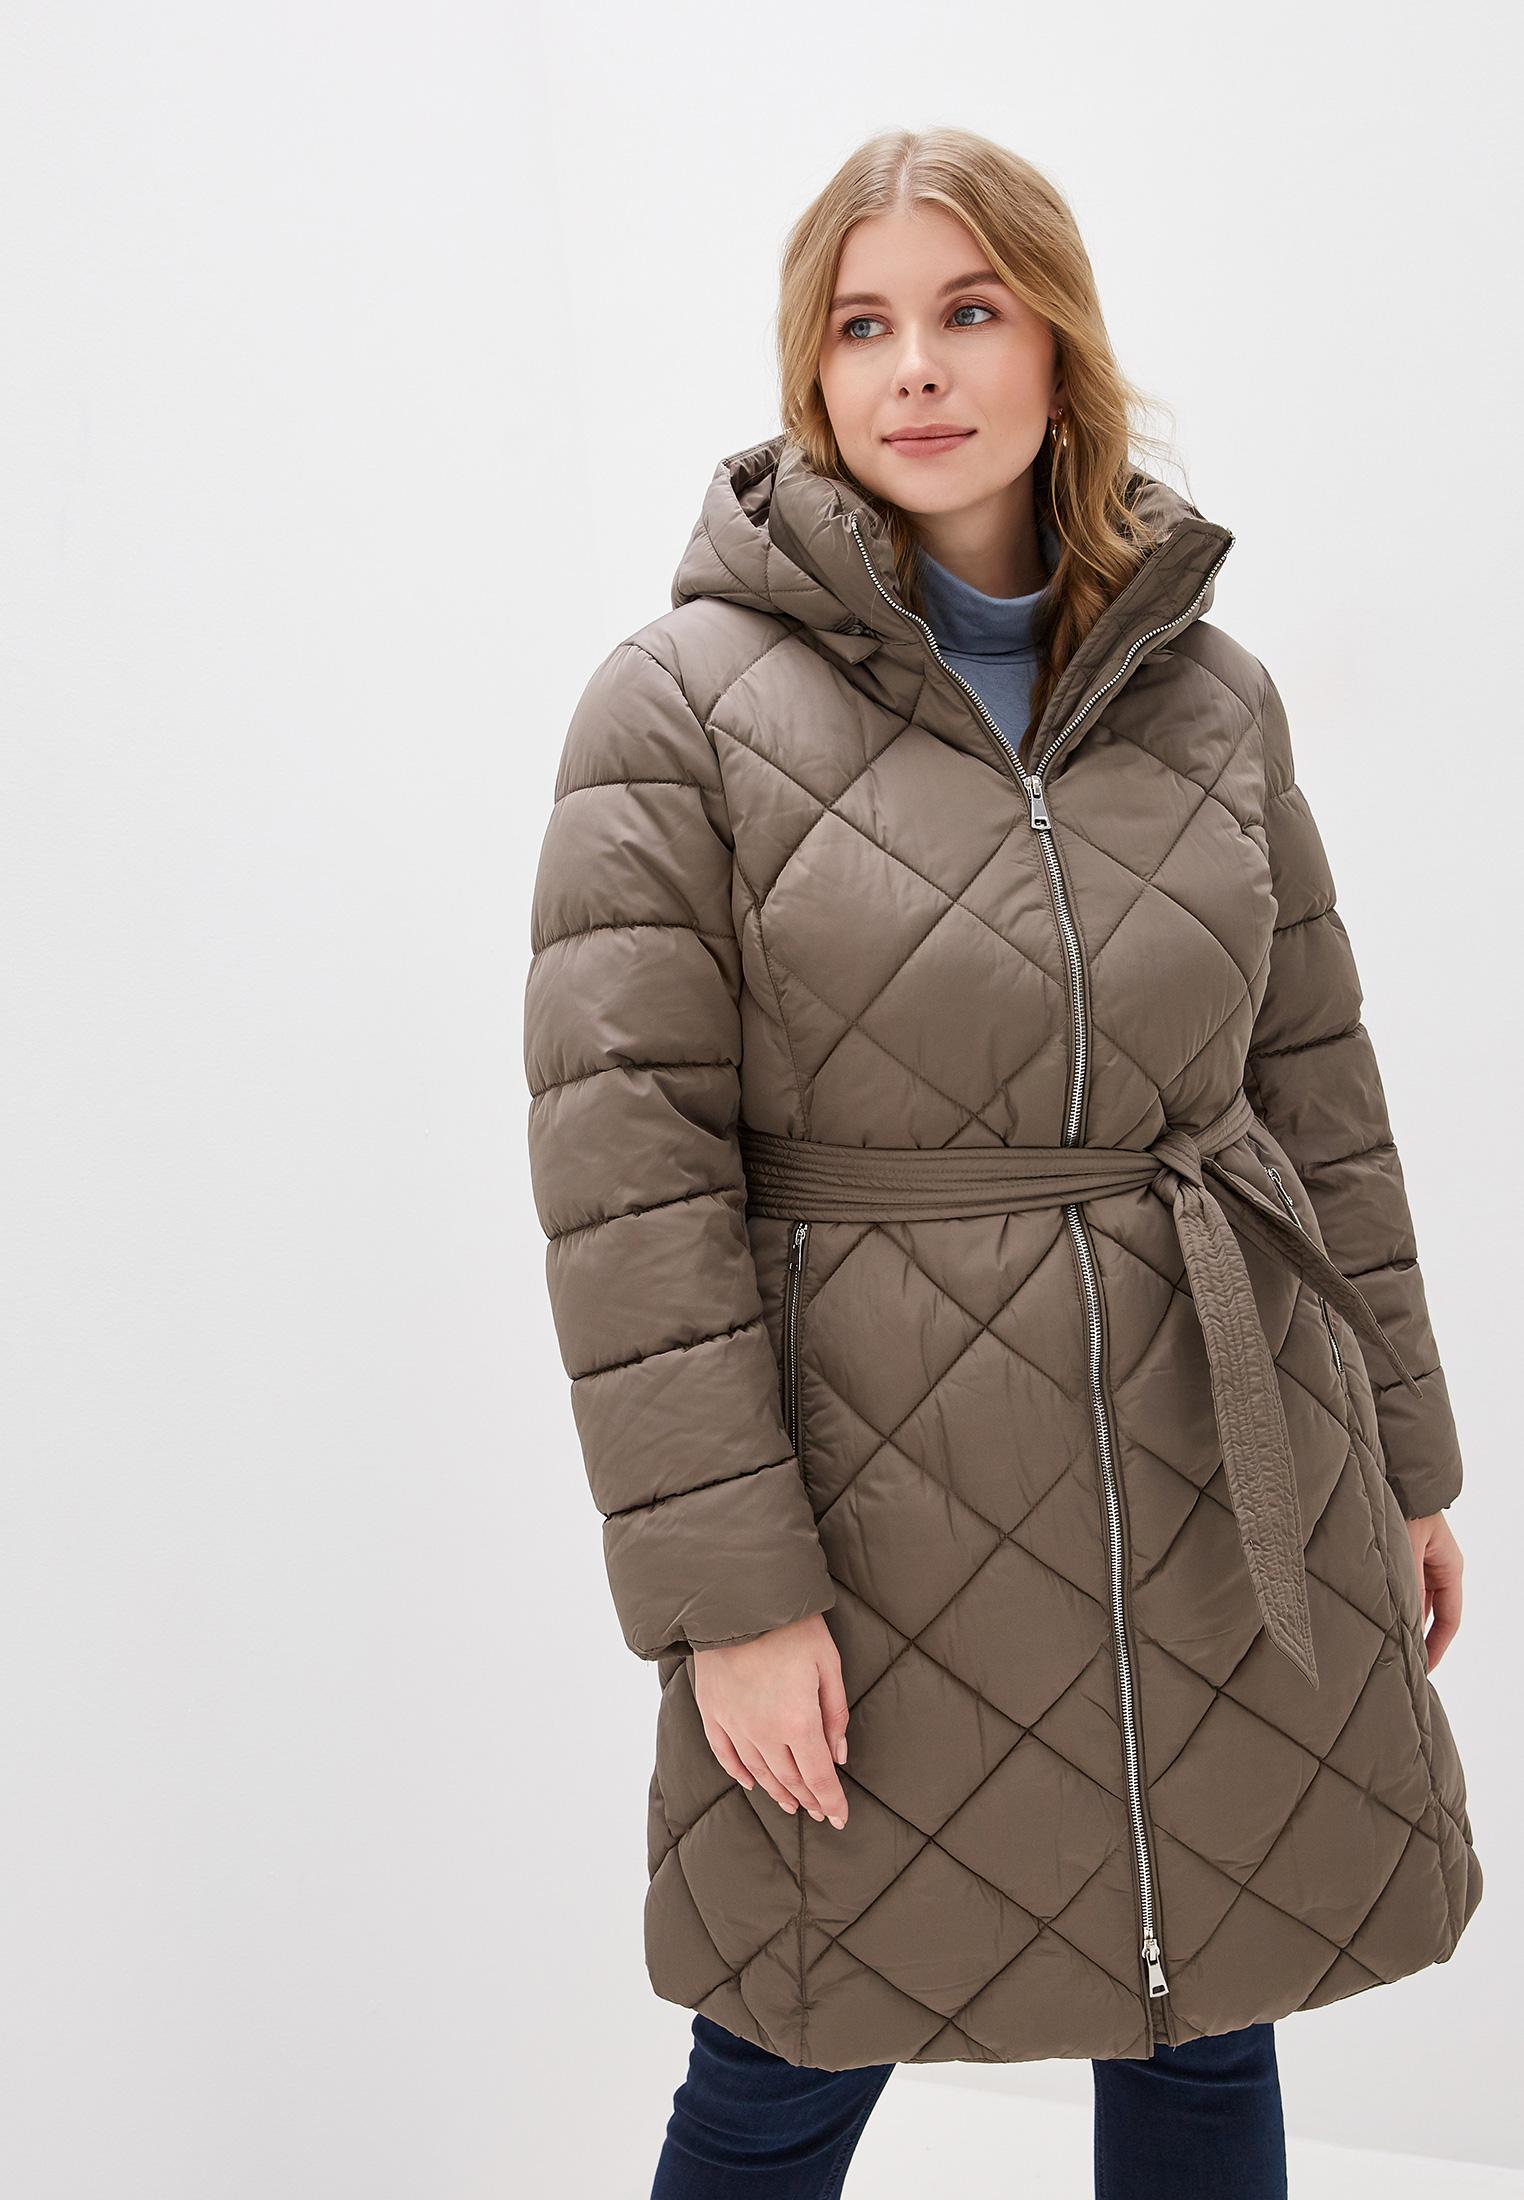 Куртка утепленная, Zarina, цвет: хаки. Артикул: MP002XW11XFO. Одежда / Верхняя одежда